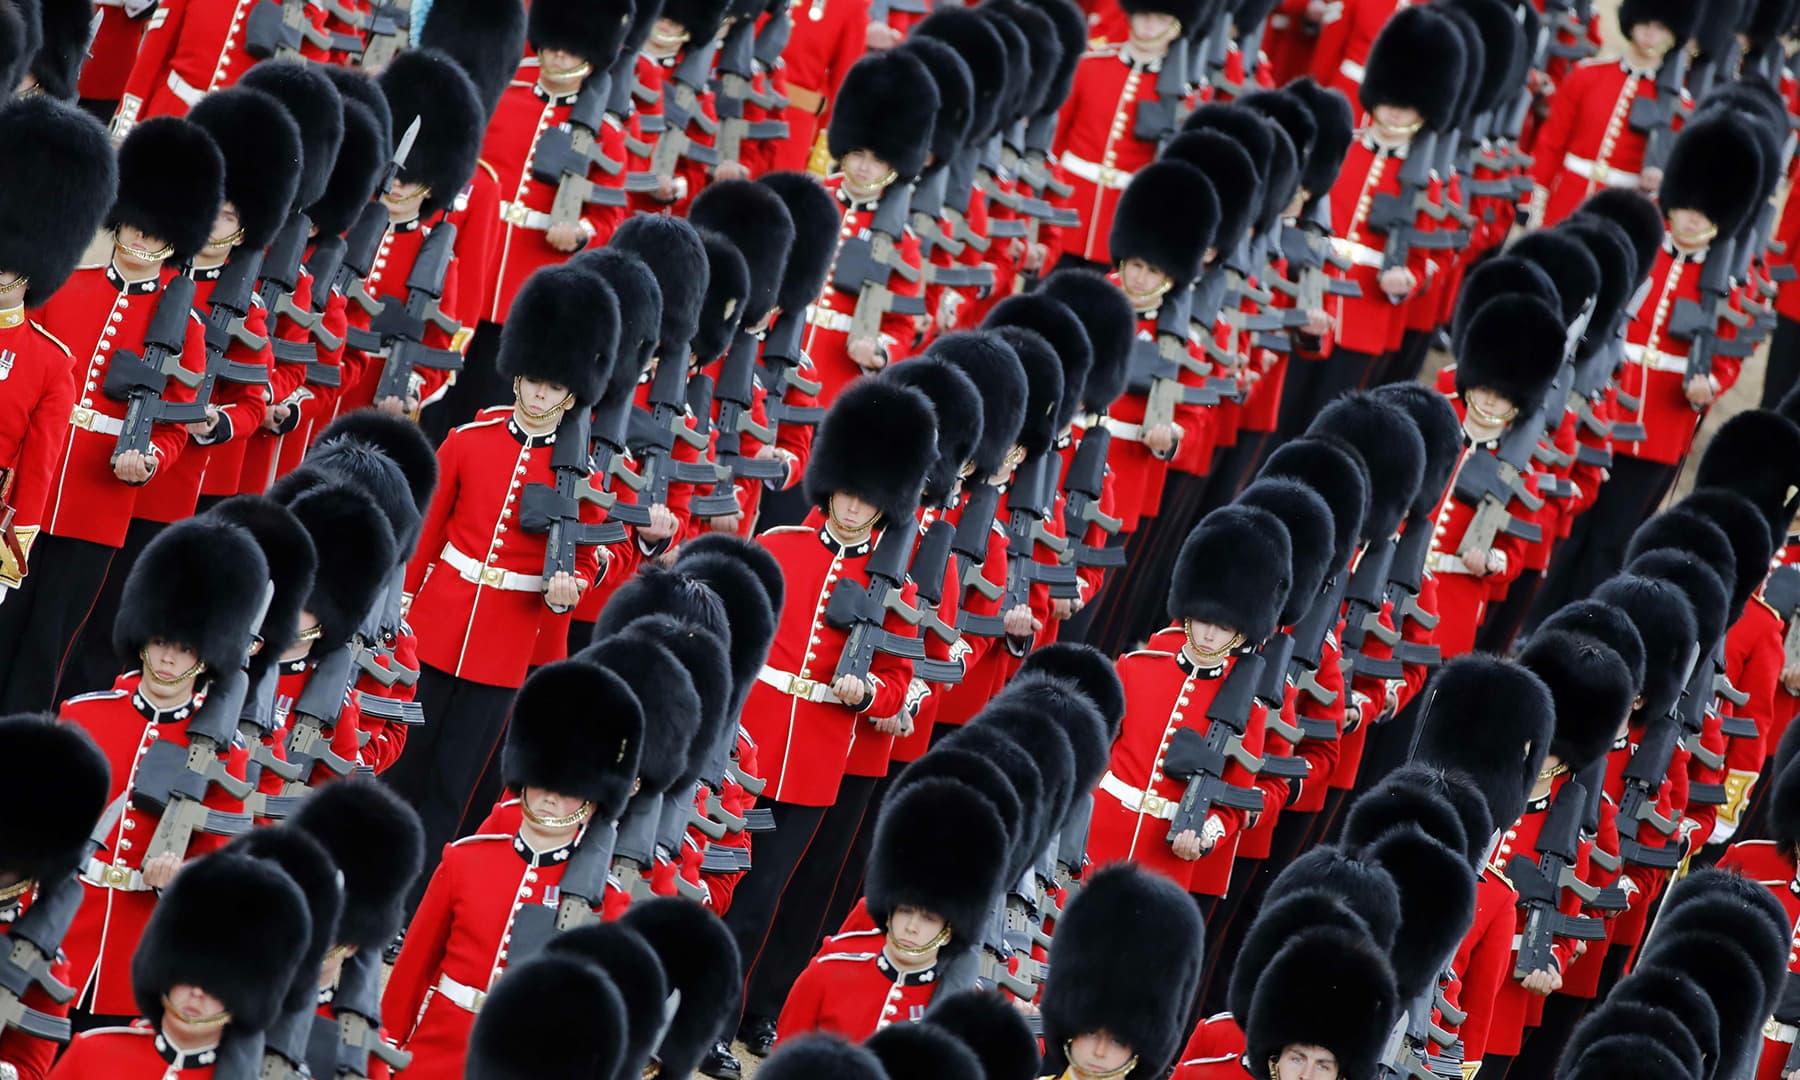 Members of the Grenadier Guards perform. — AFP